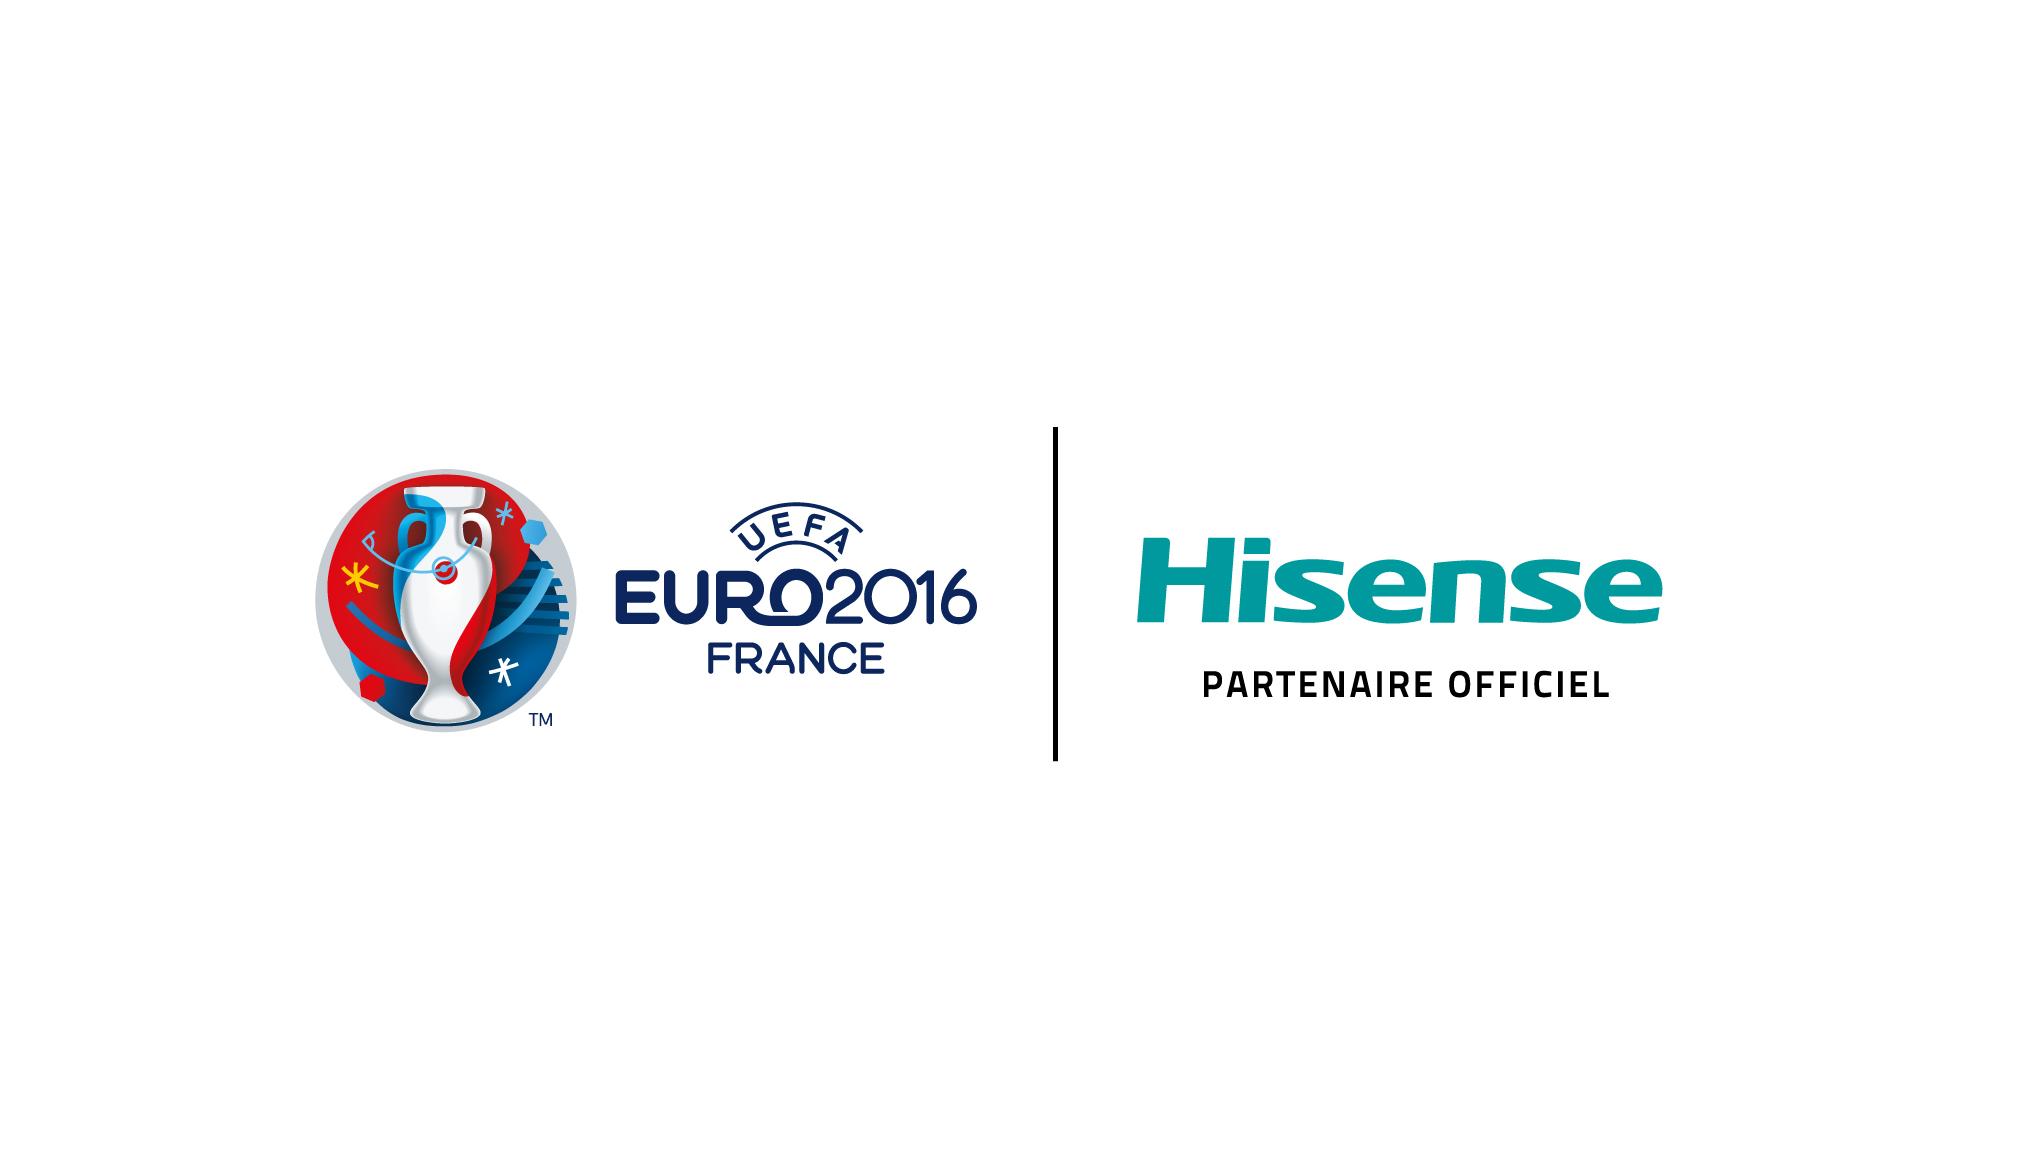 hisense uefa partenariat